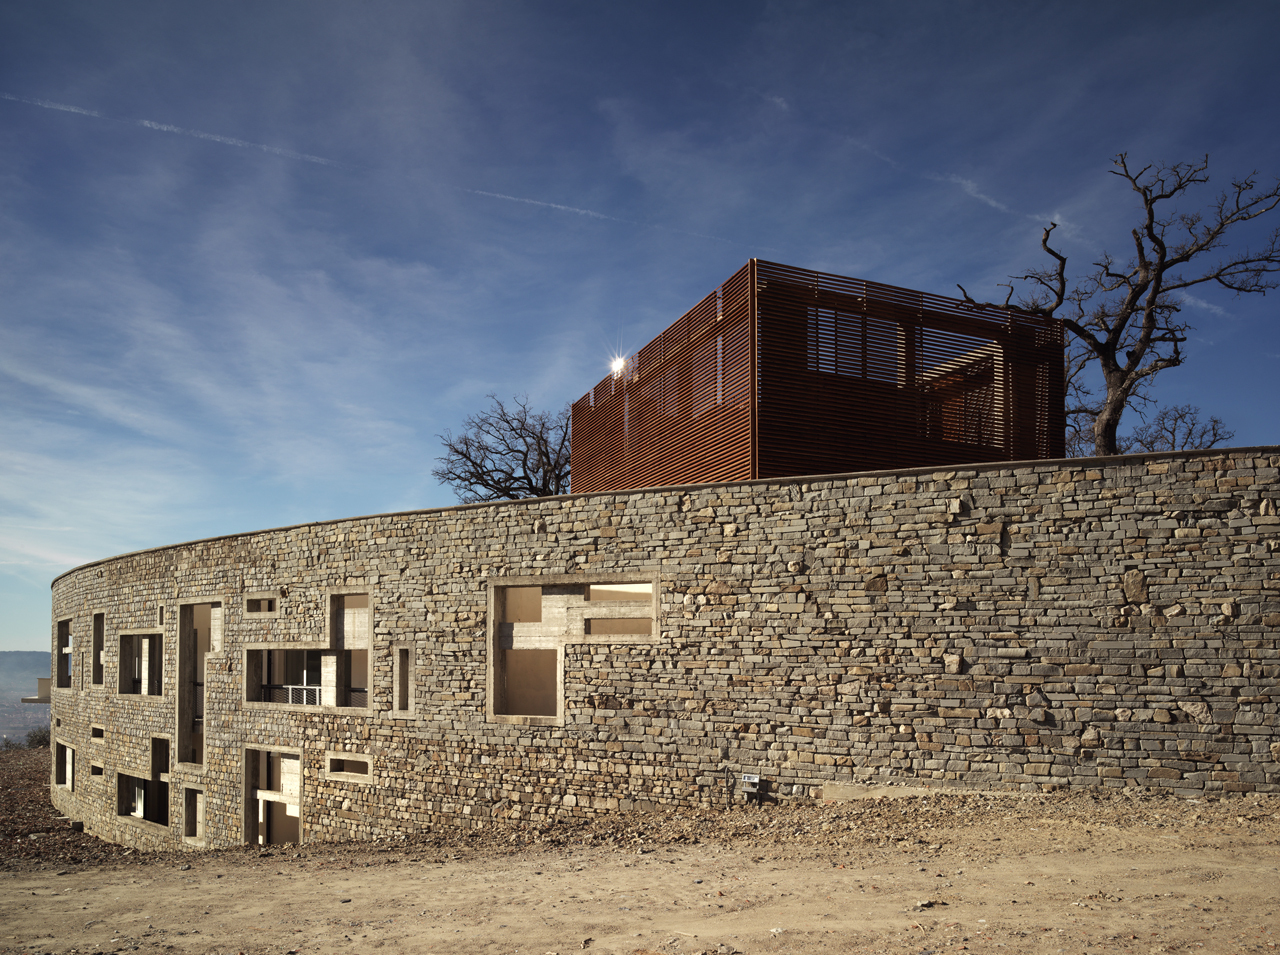 Centro de Saúde e Casa de Repouso / IPOSTUDIO Architects, © Pietro Savorelli